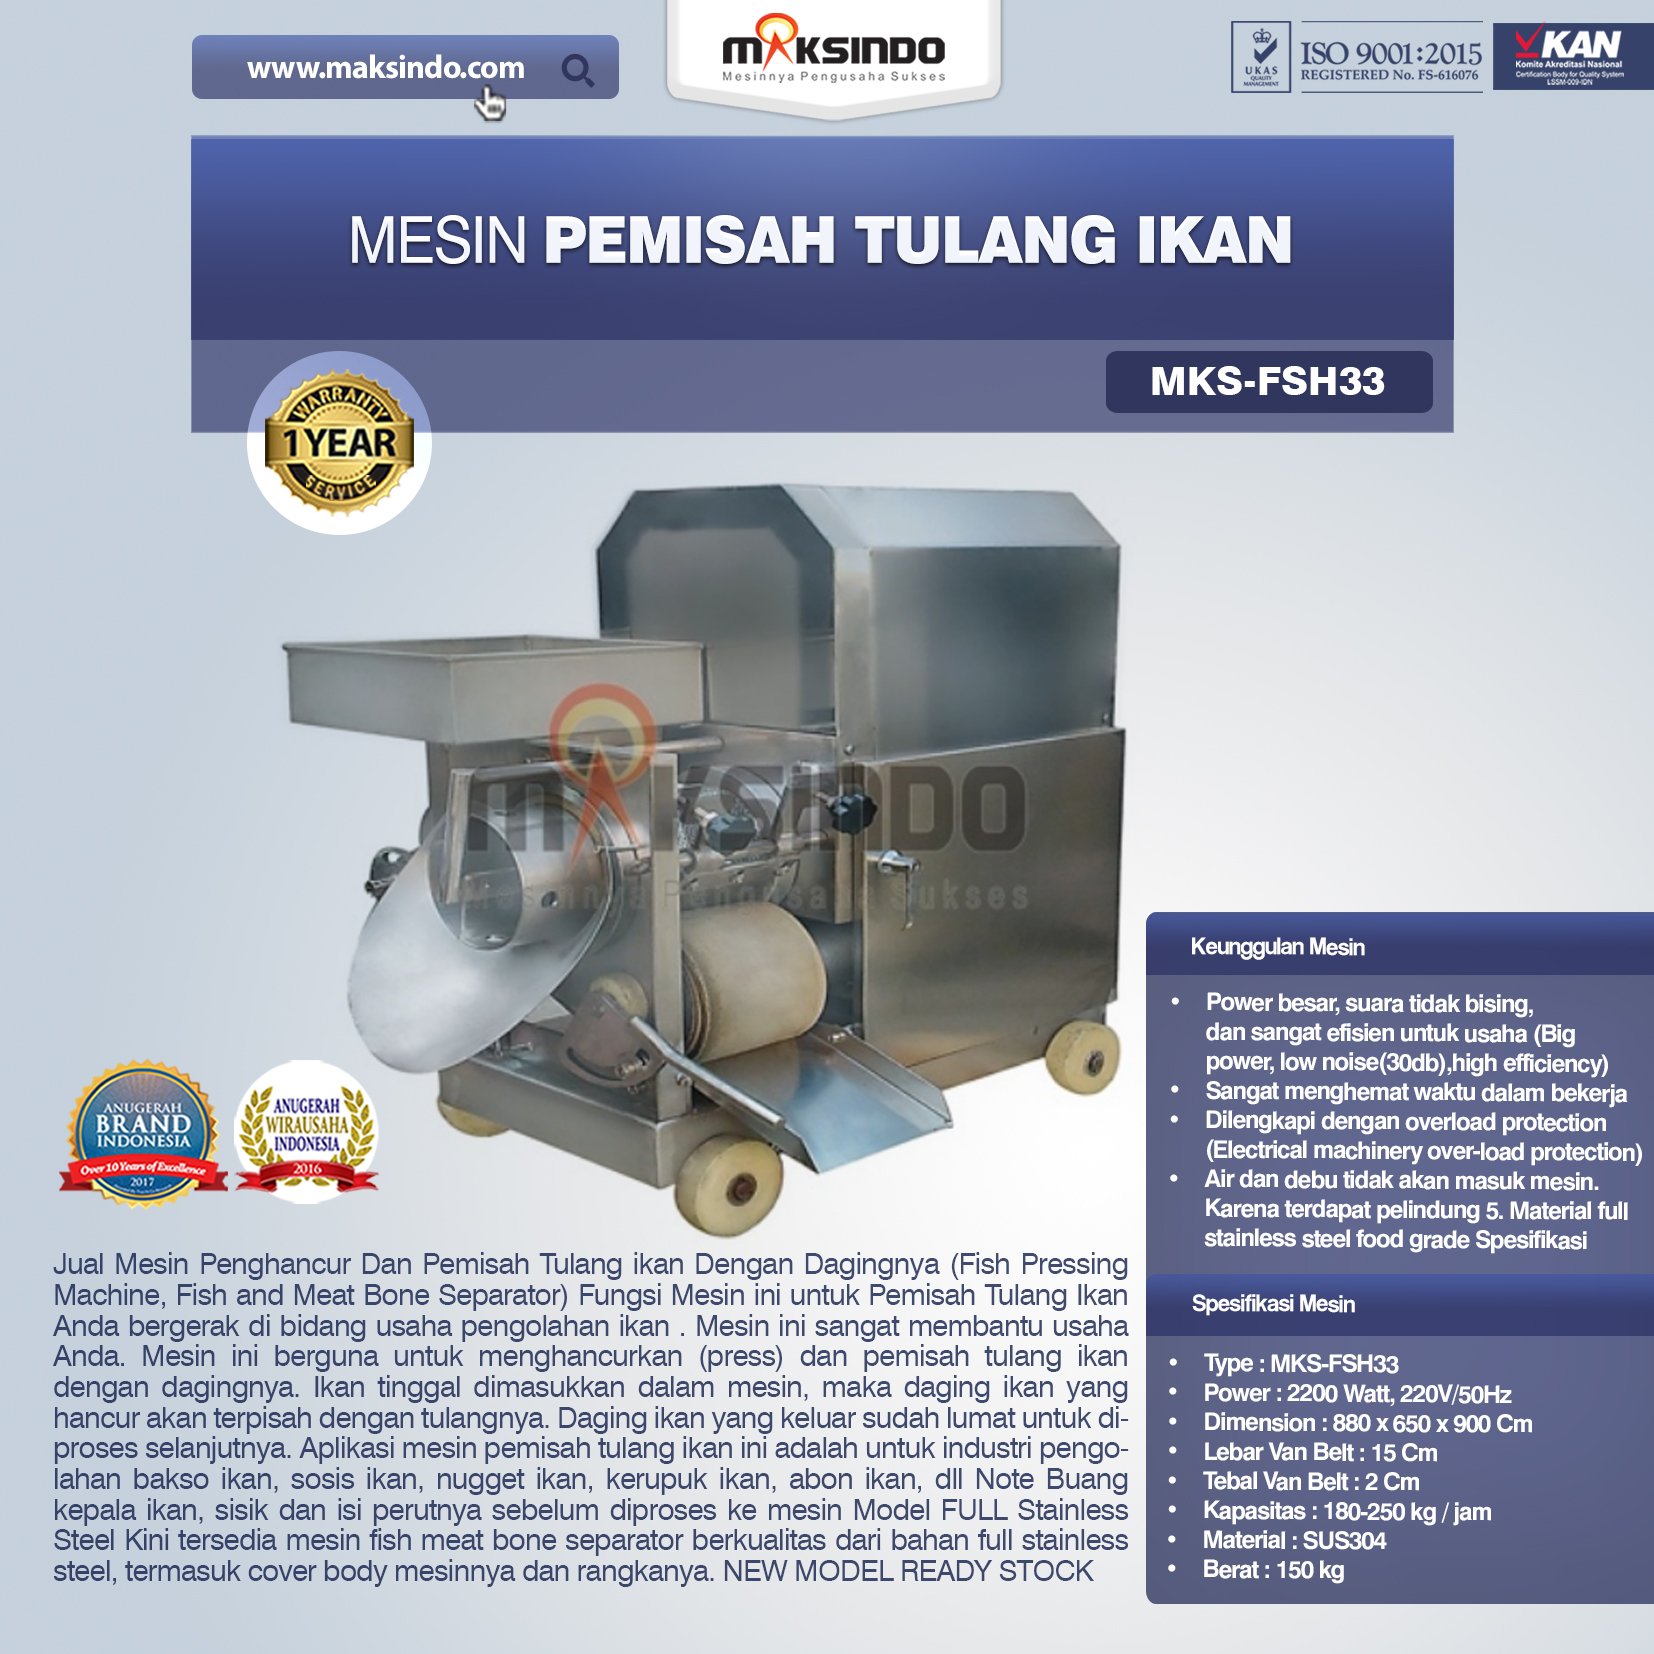 Jual Mesin Pemisah Tulang Ikan (FSH33) di Pekanbaru